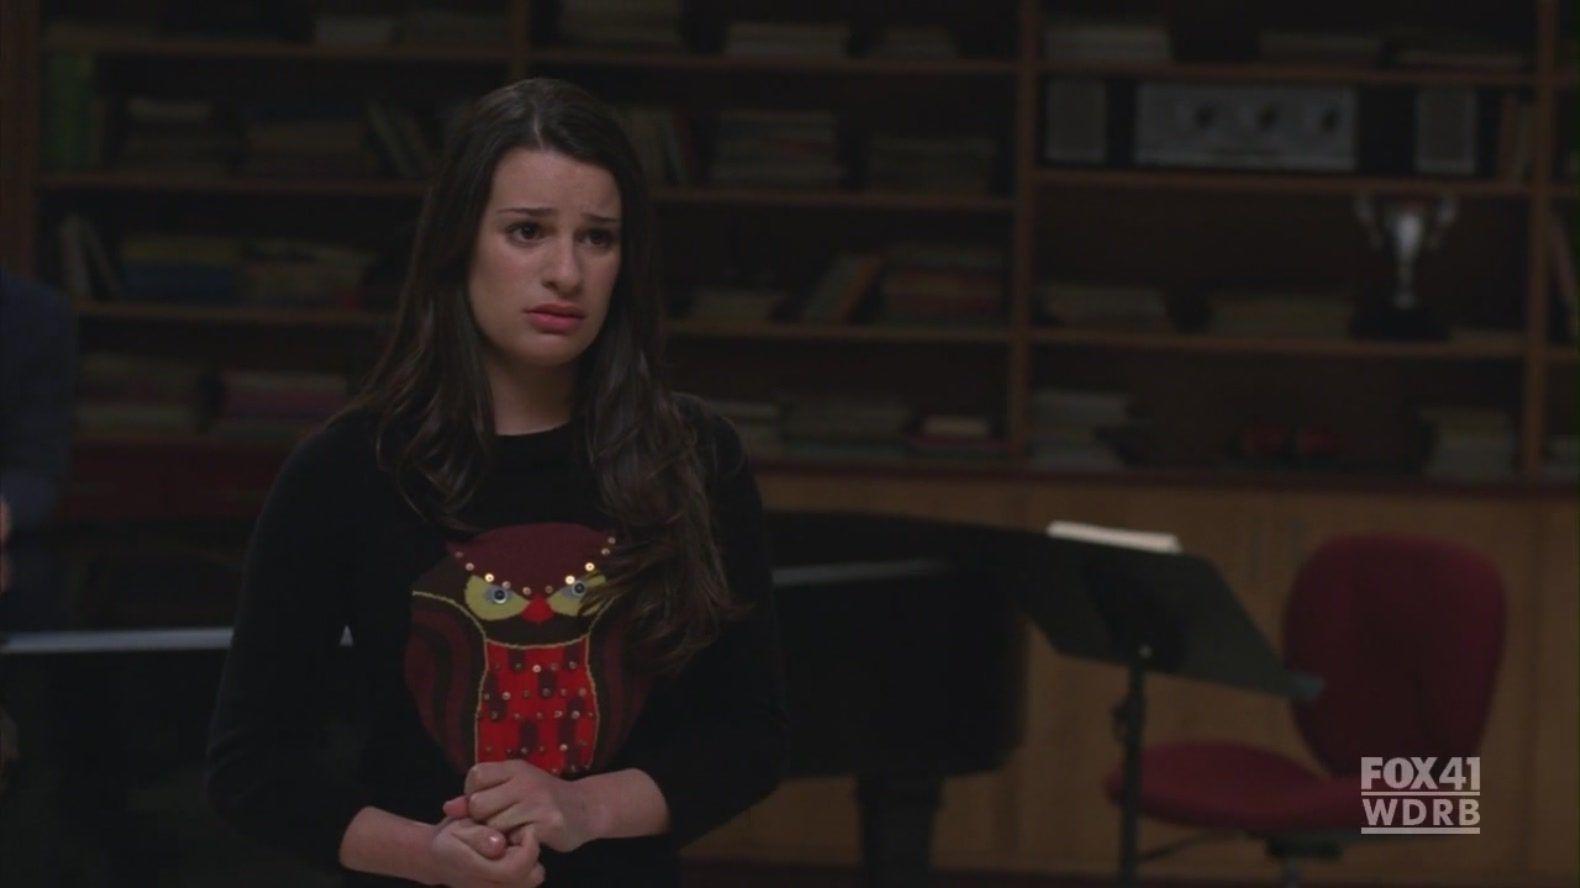 Roupas do Glee :D - Página 4 Rachel+berry+owl+sweater